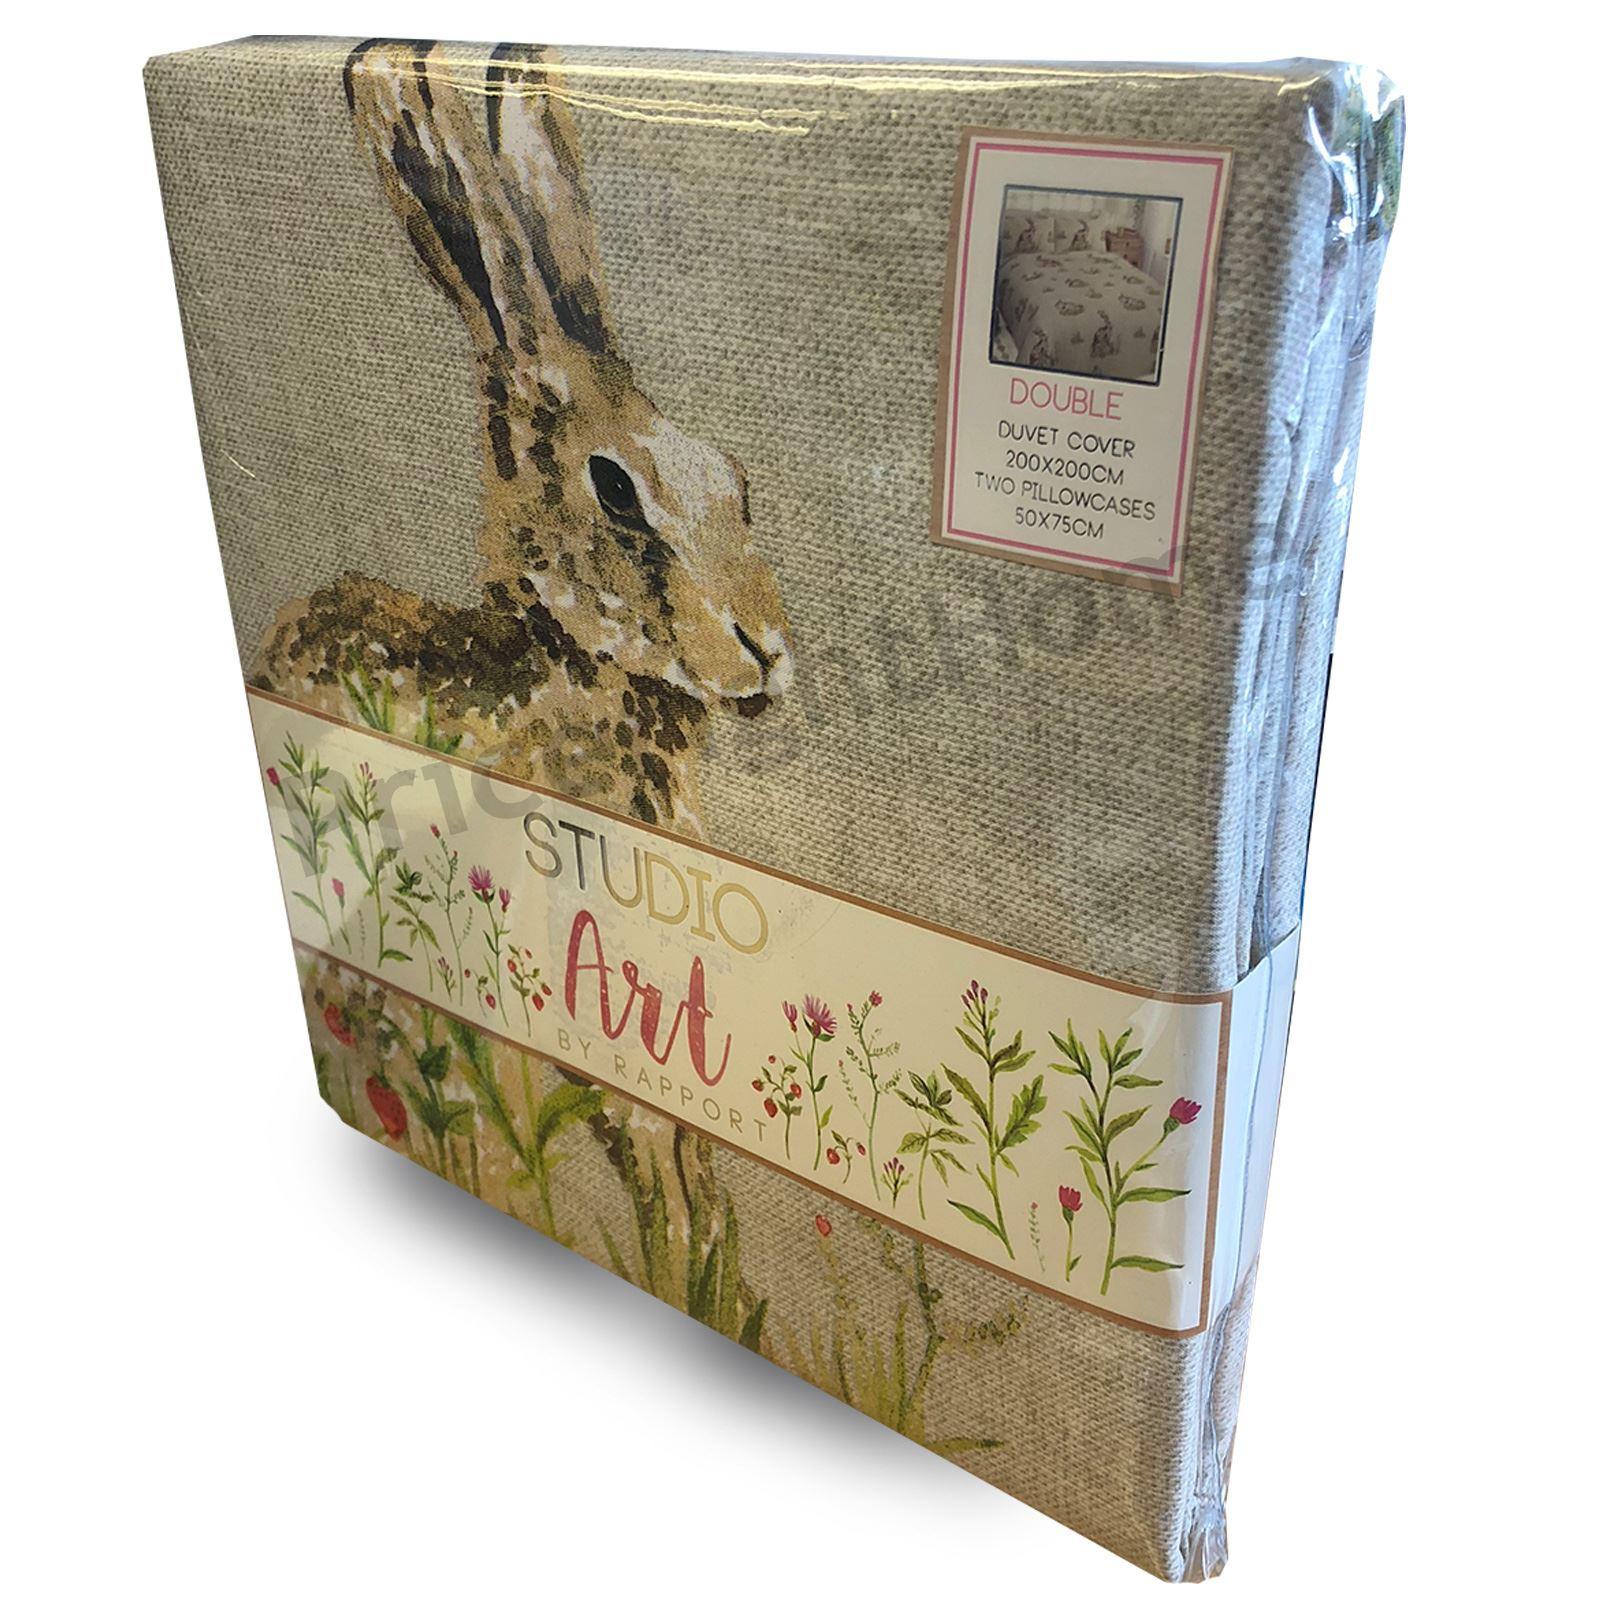 País Bumpkin Doble Duvet cover set ropa de Cama Woodland Animales liebres